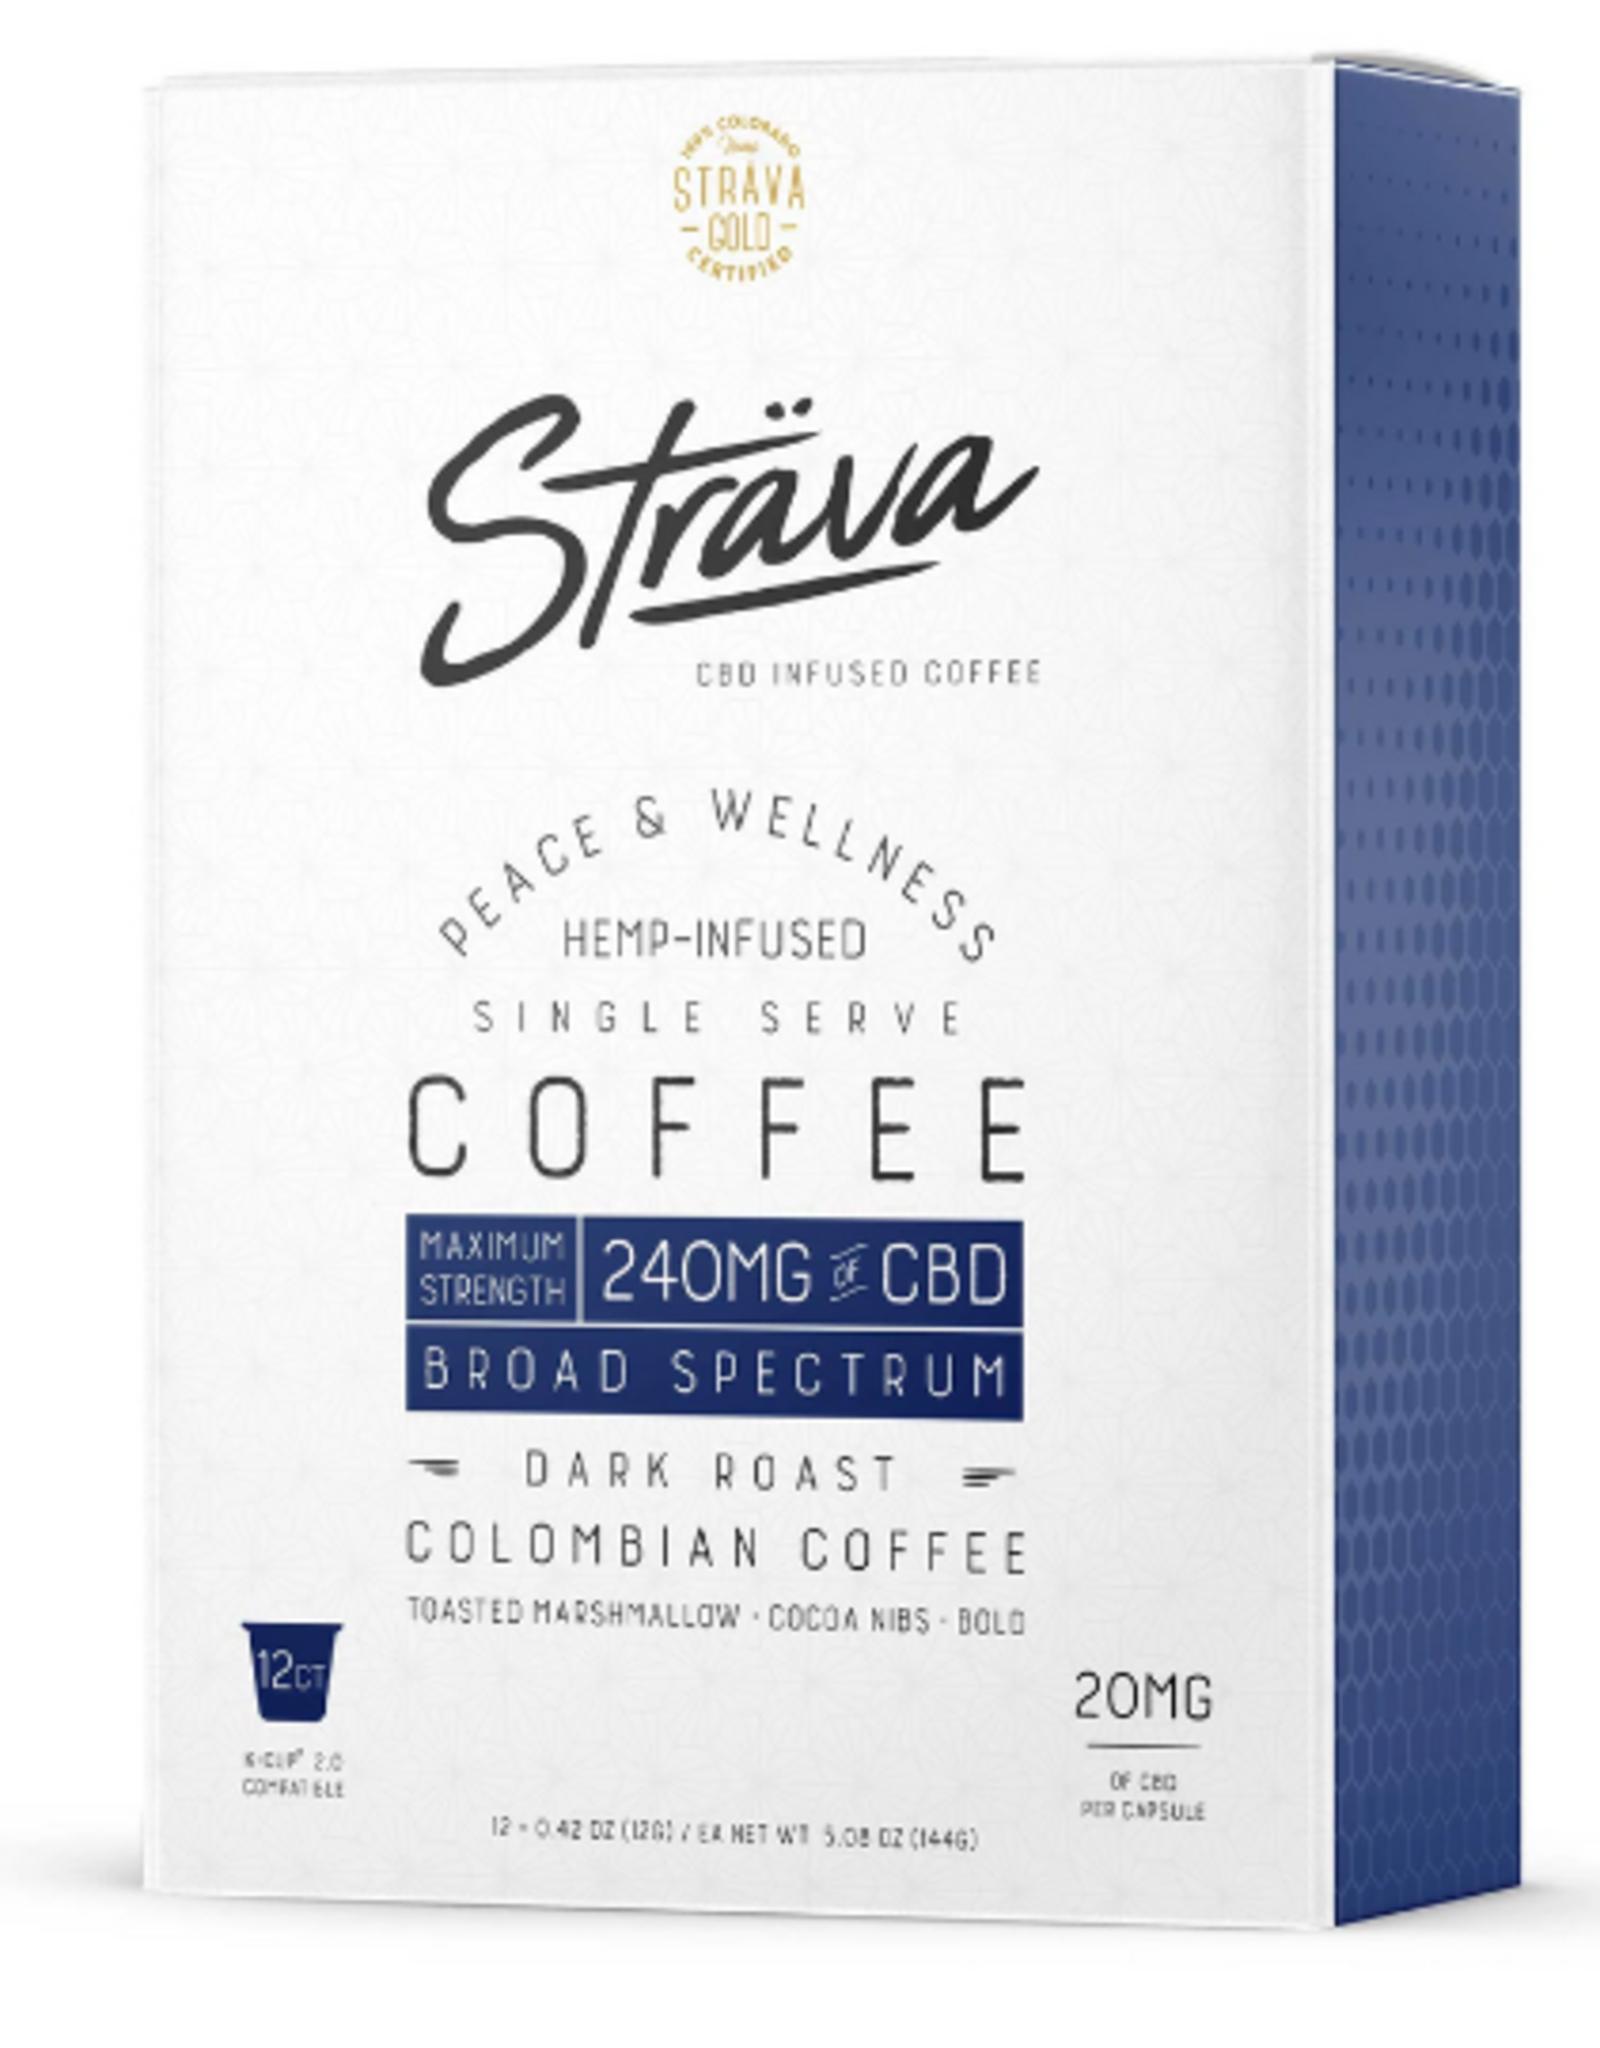 Strava CBD Coffee K Cups - Max Strength 12 Pack